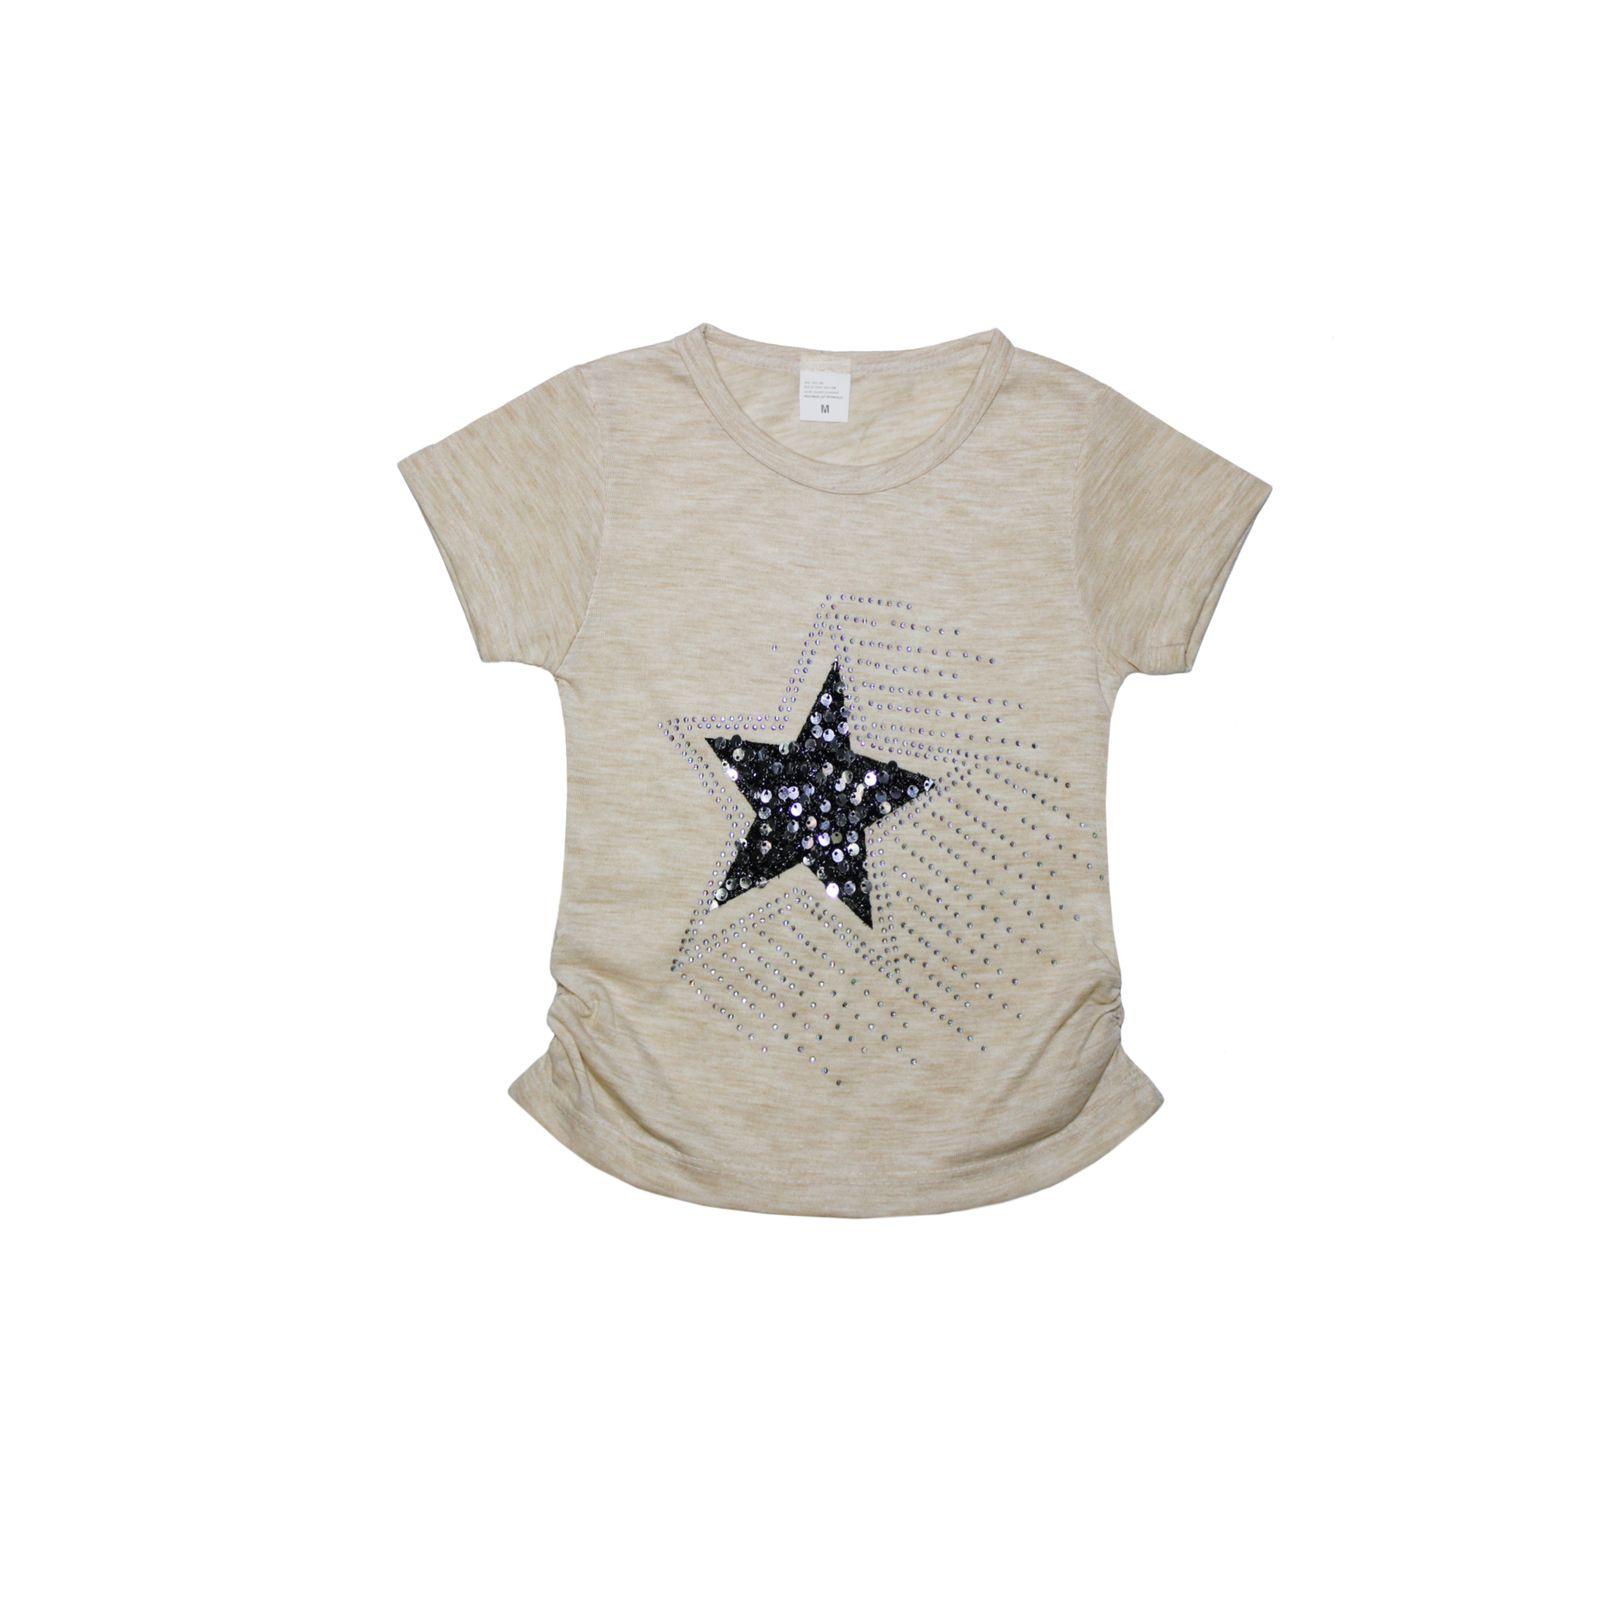 ست تیشرت و شلوارک دخترانه طرح ستاره کد ۱۳۶۱ -  - 4